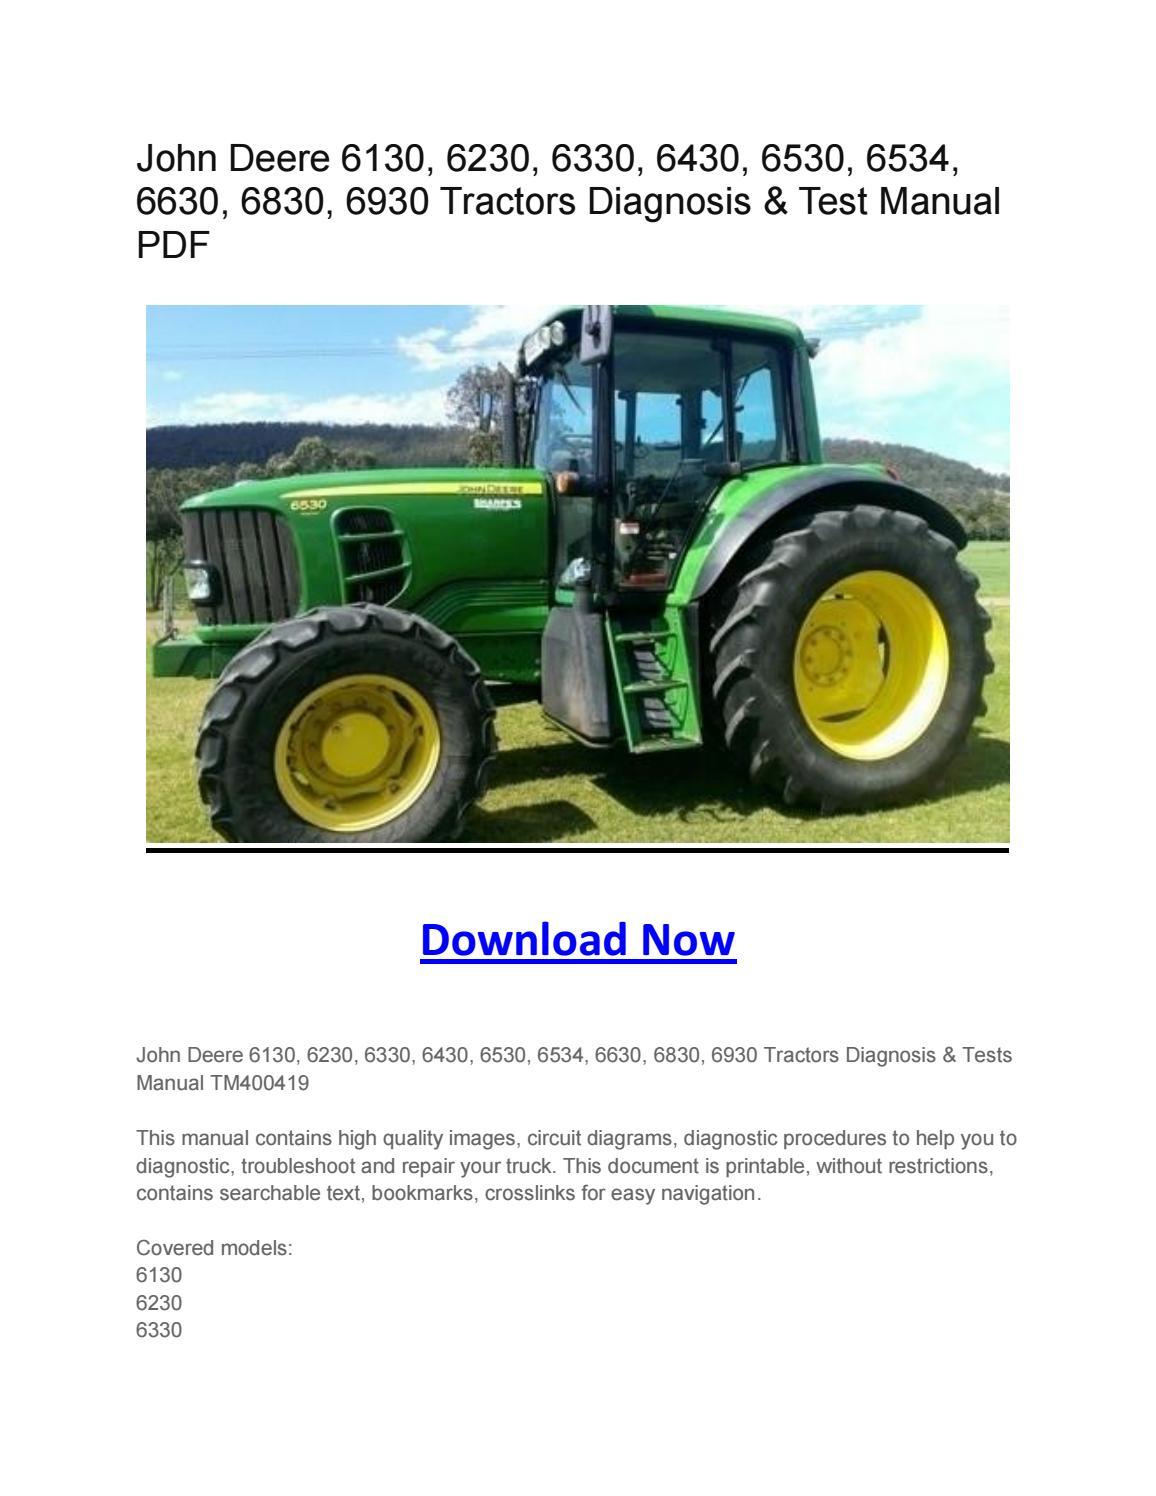 john deere 6130, 6230, 6330, 6430, 6530, 6534, 6630, 6830, 6930 tractors  diagnosis & test manual pdf